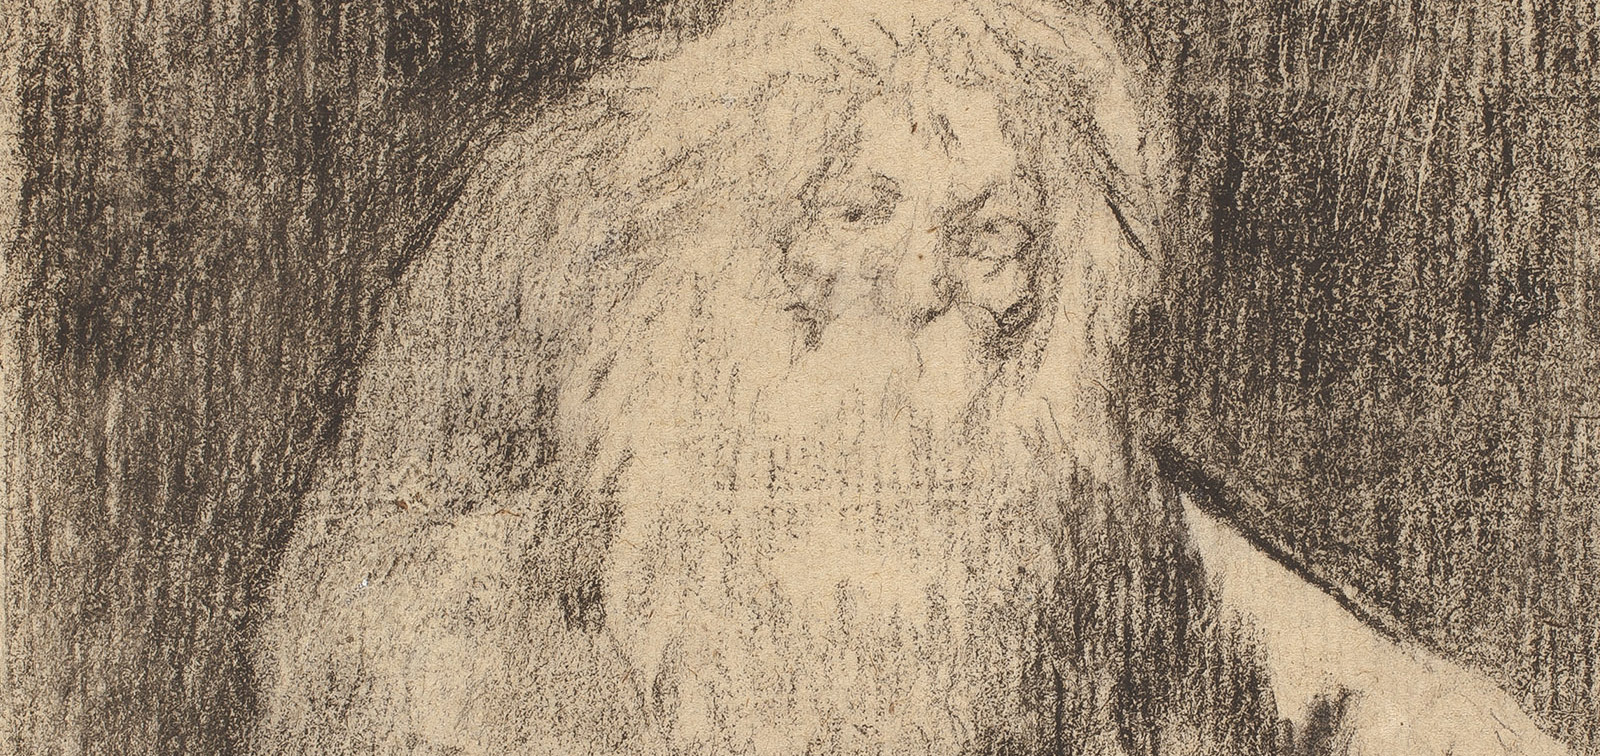 <em>Sólo la voluntad me sobra. Dibujos de Goya</em>